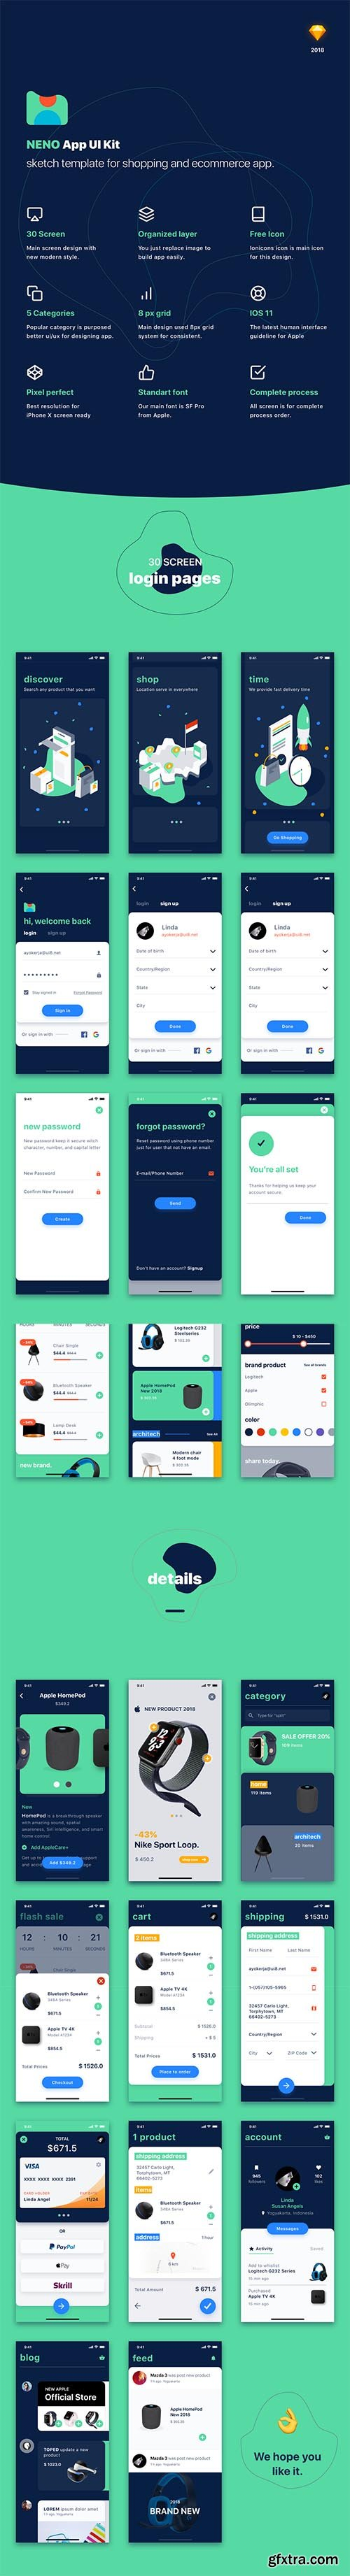 NENO App UI Kit